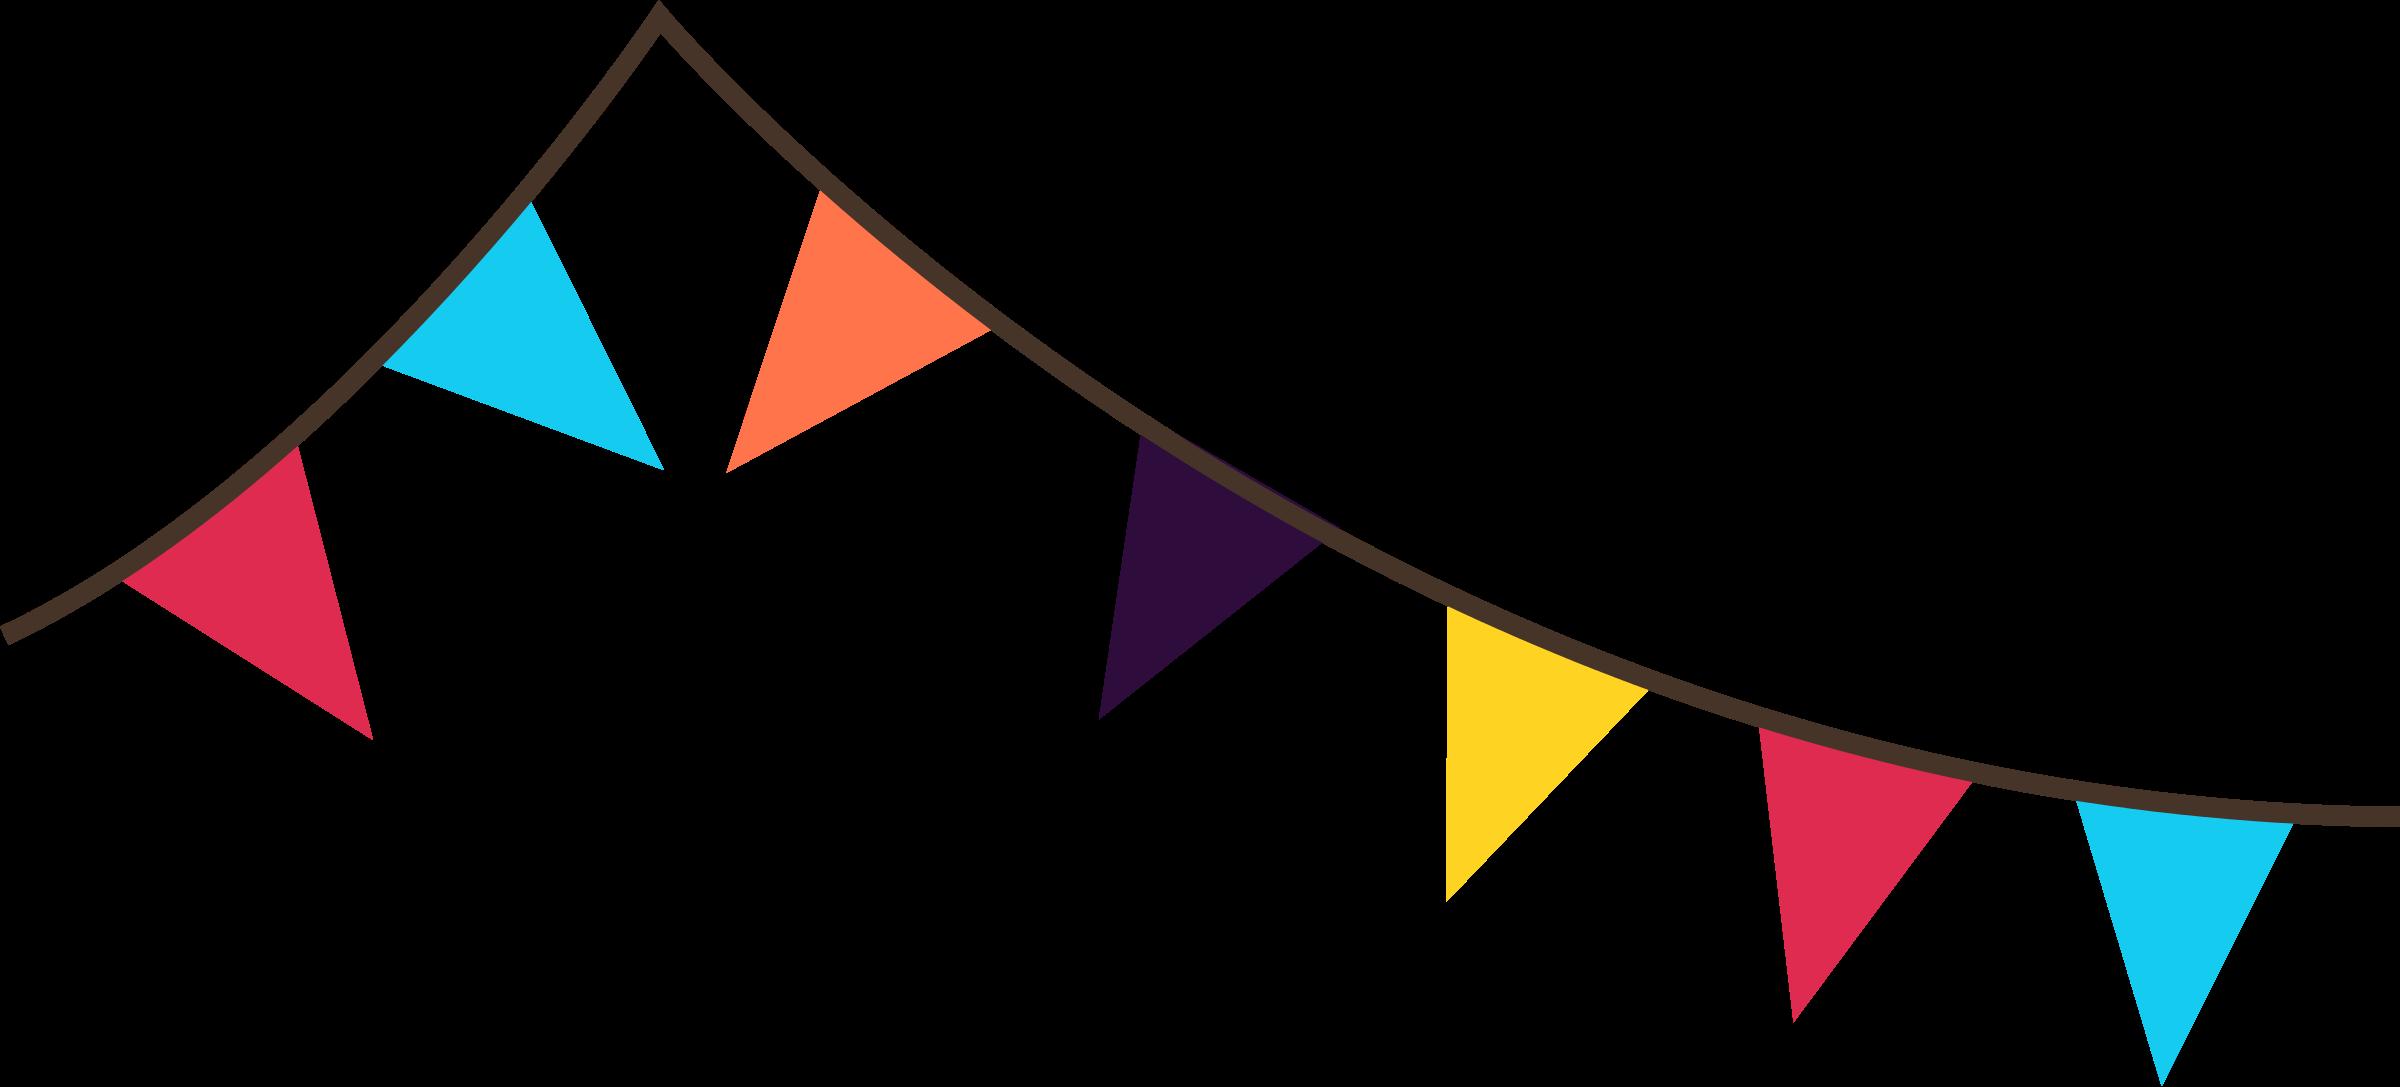 Clipart rainbow banner, Clipart rainbow banner Transparent.